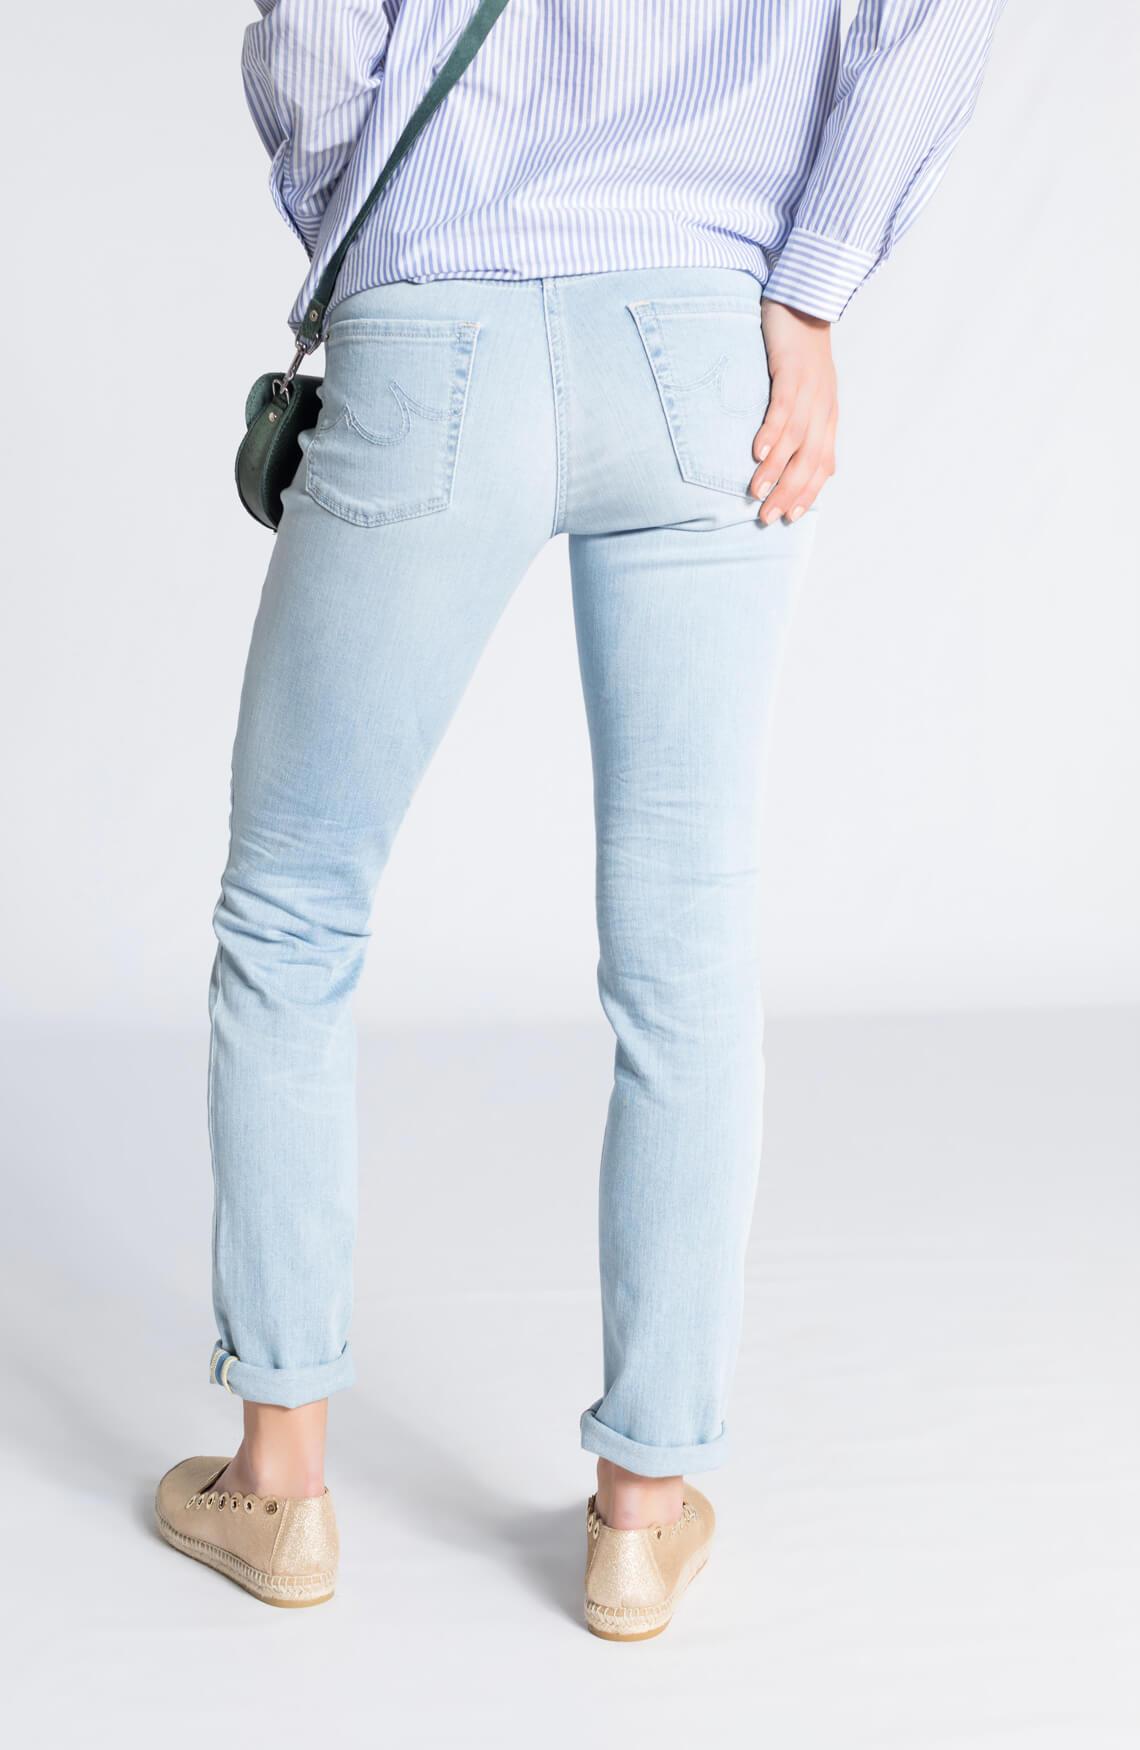 Cambio Dames Parla vintage jeans Blauw